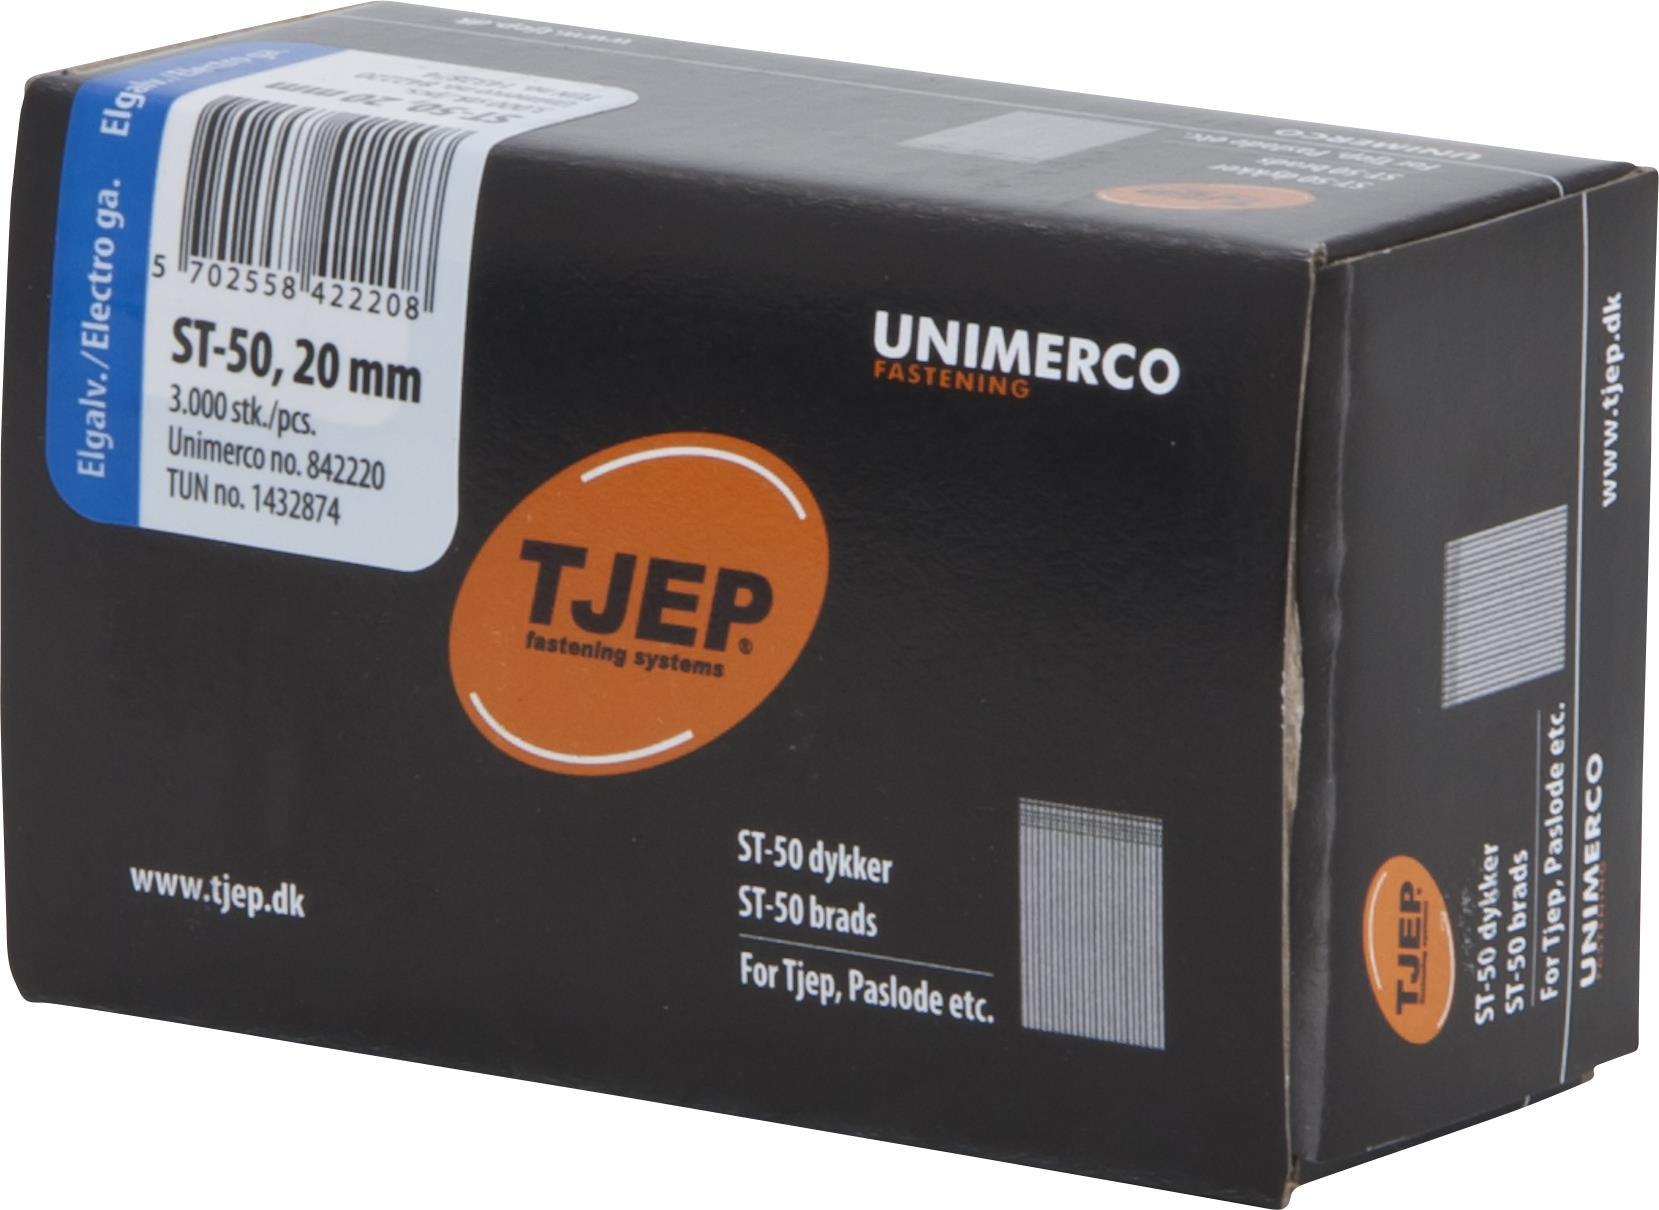 TJEP 842262 Dyckertset 18 x 20-25-30-35-40-50 mm ST-50 FZB 2400-pack